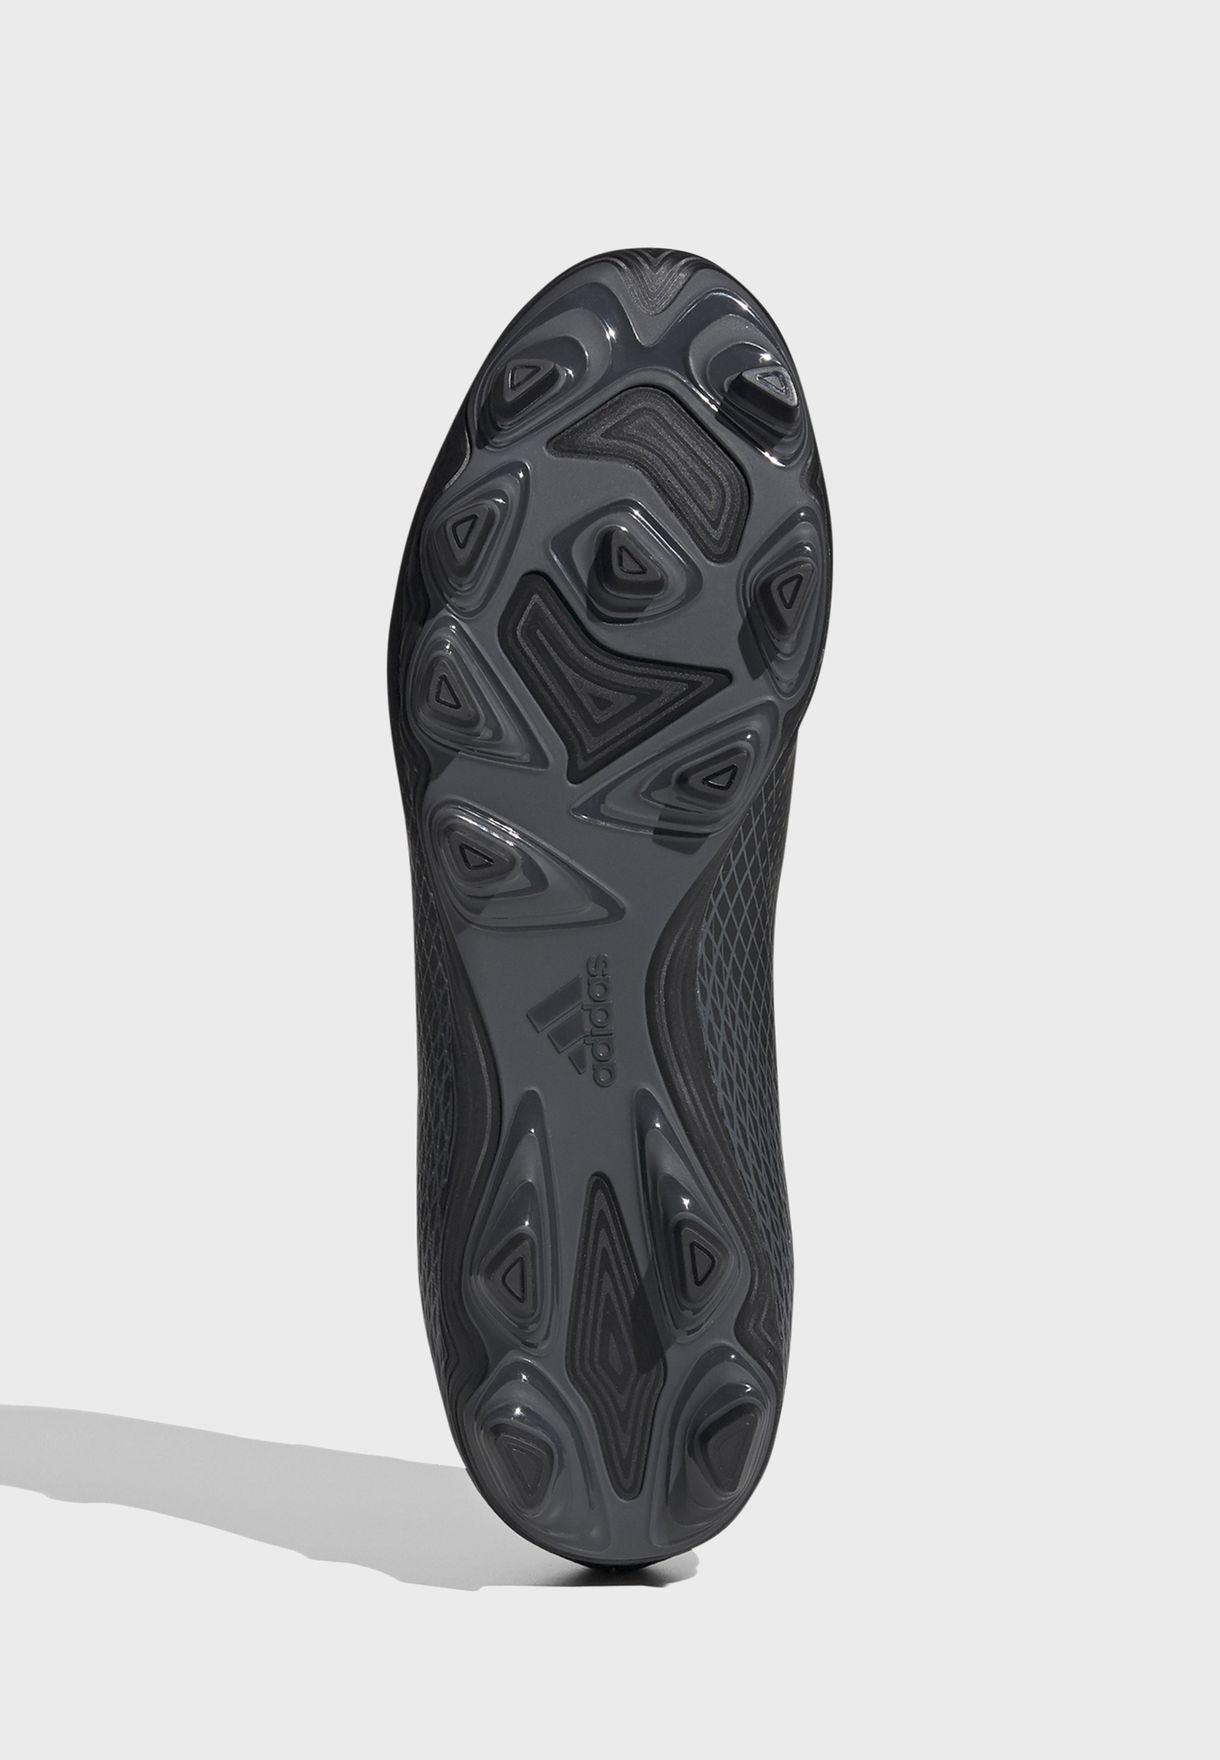 حذاء اكس غوستيد 3 اف اكس جي